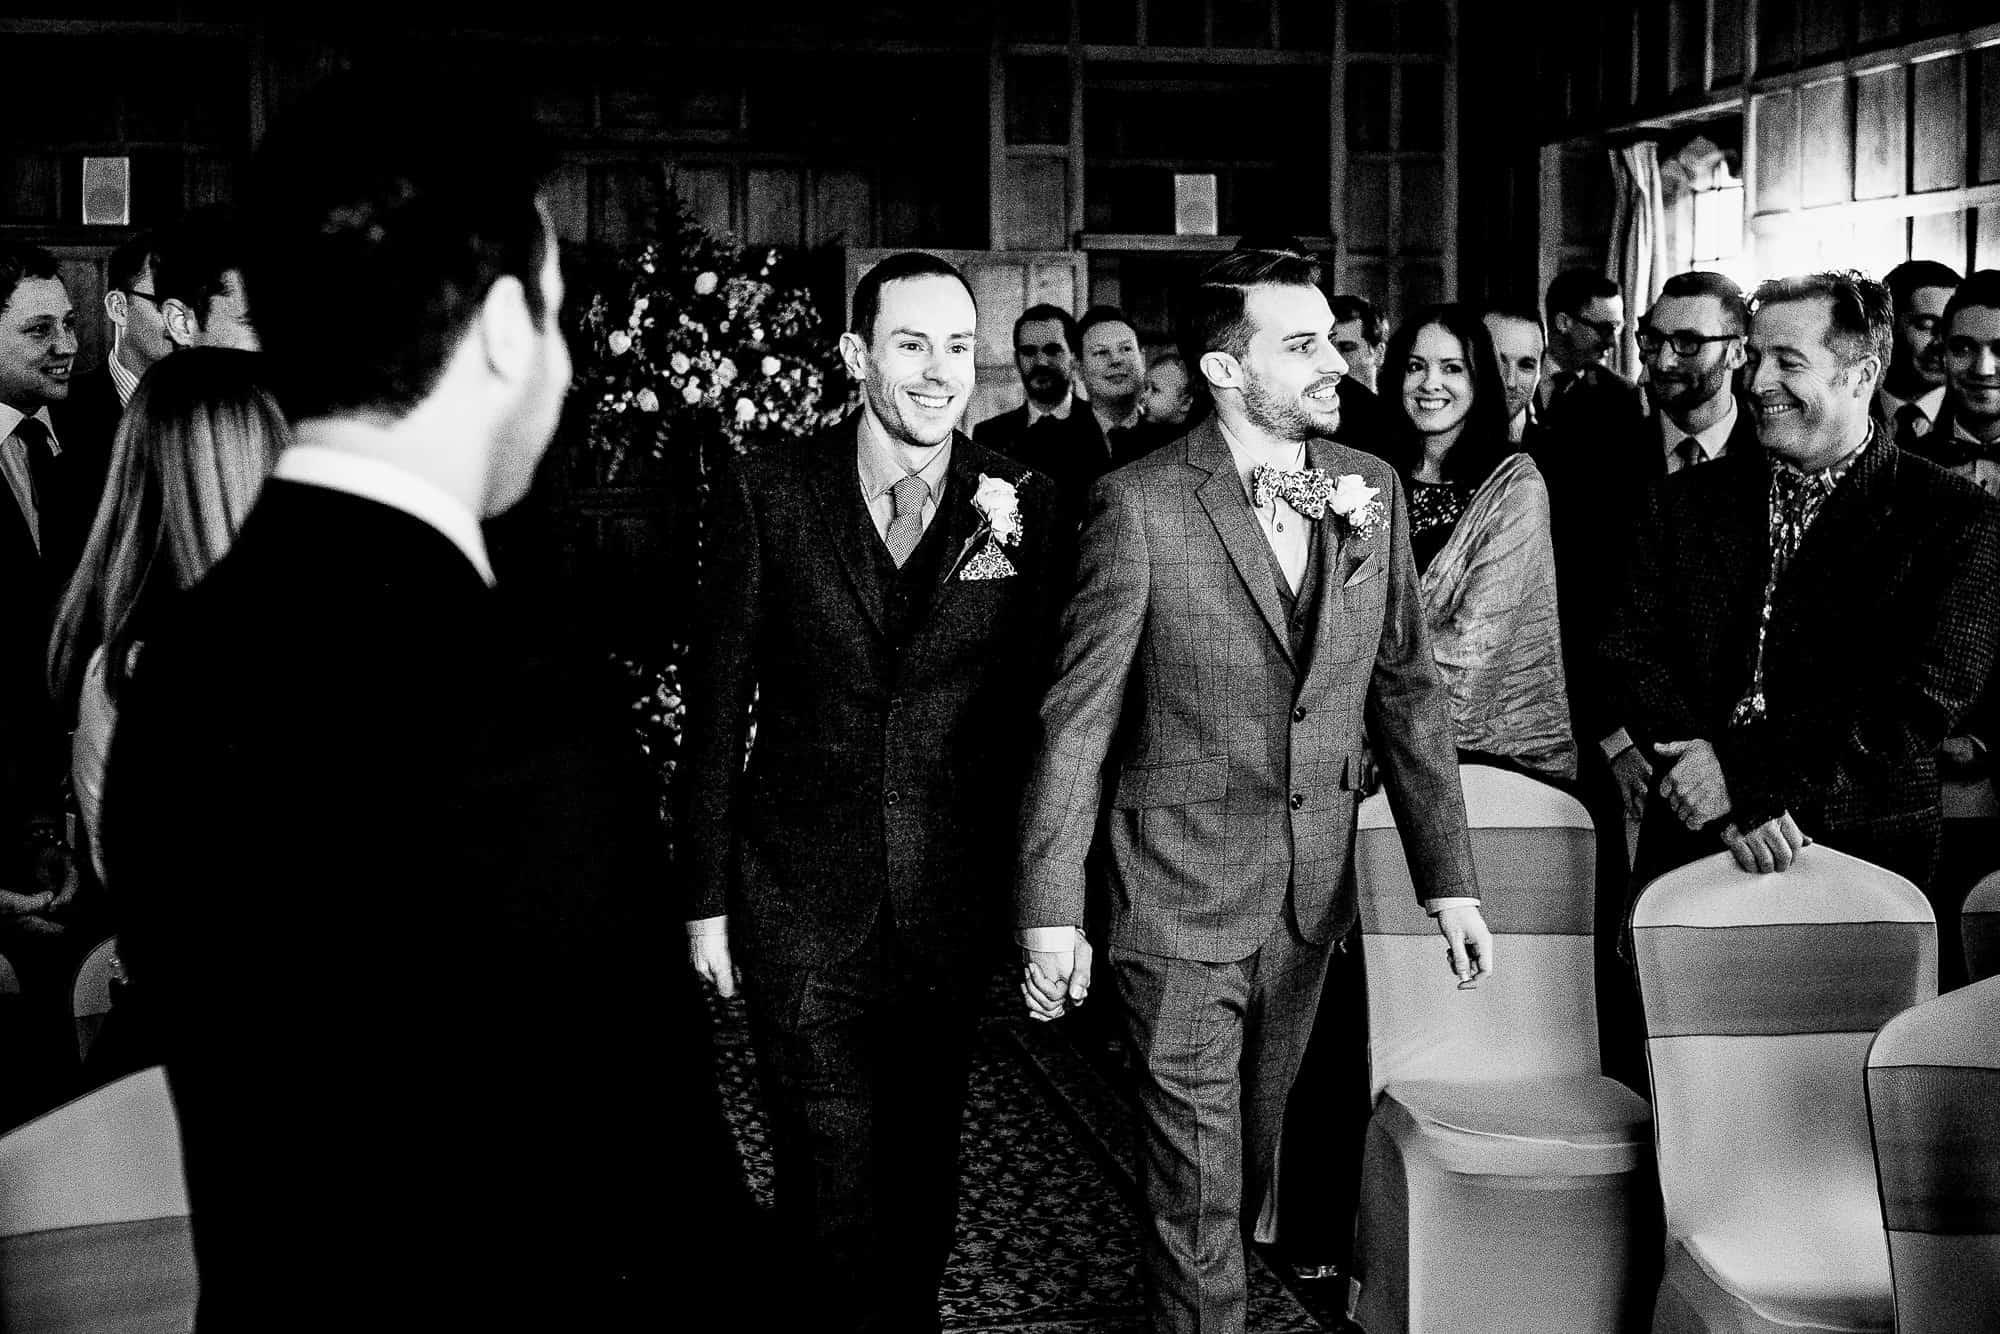 lympne-castle-wedding-photographer-matt-tyler-0012